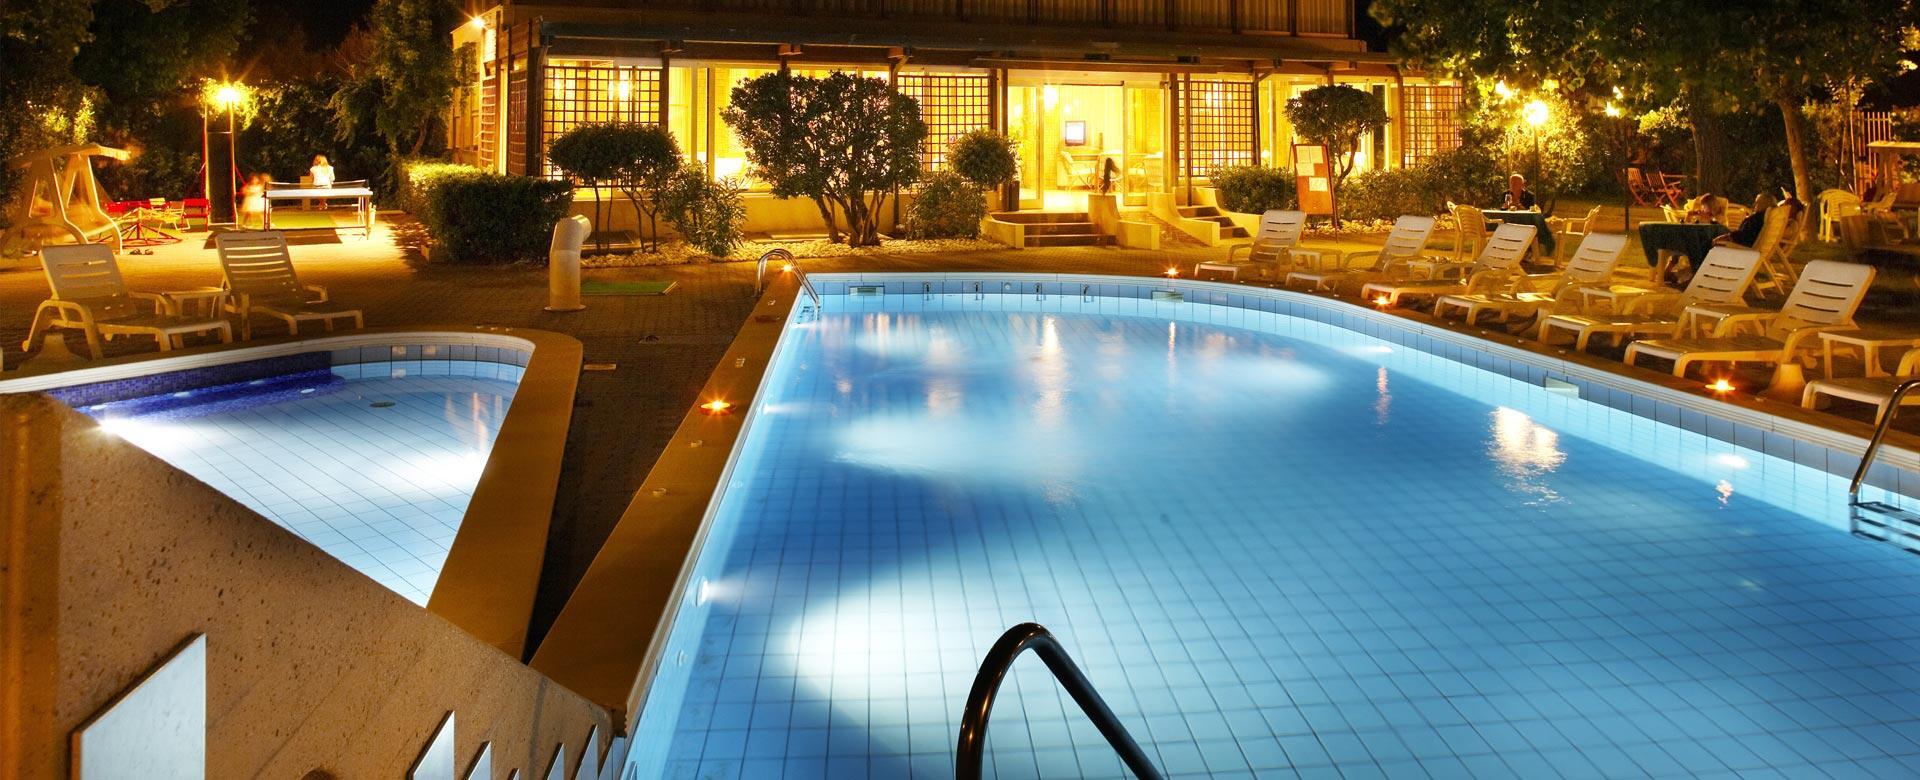 alexandraplaza en hotel-pool-riccione 005